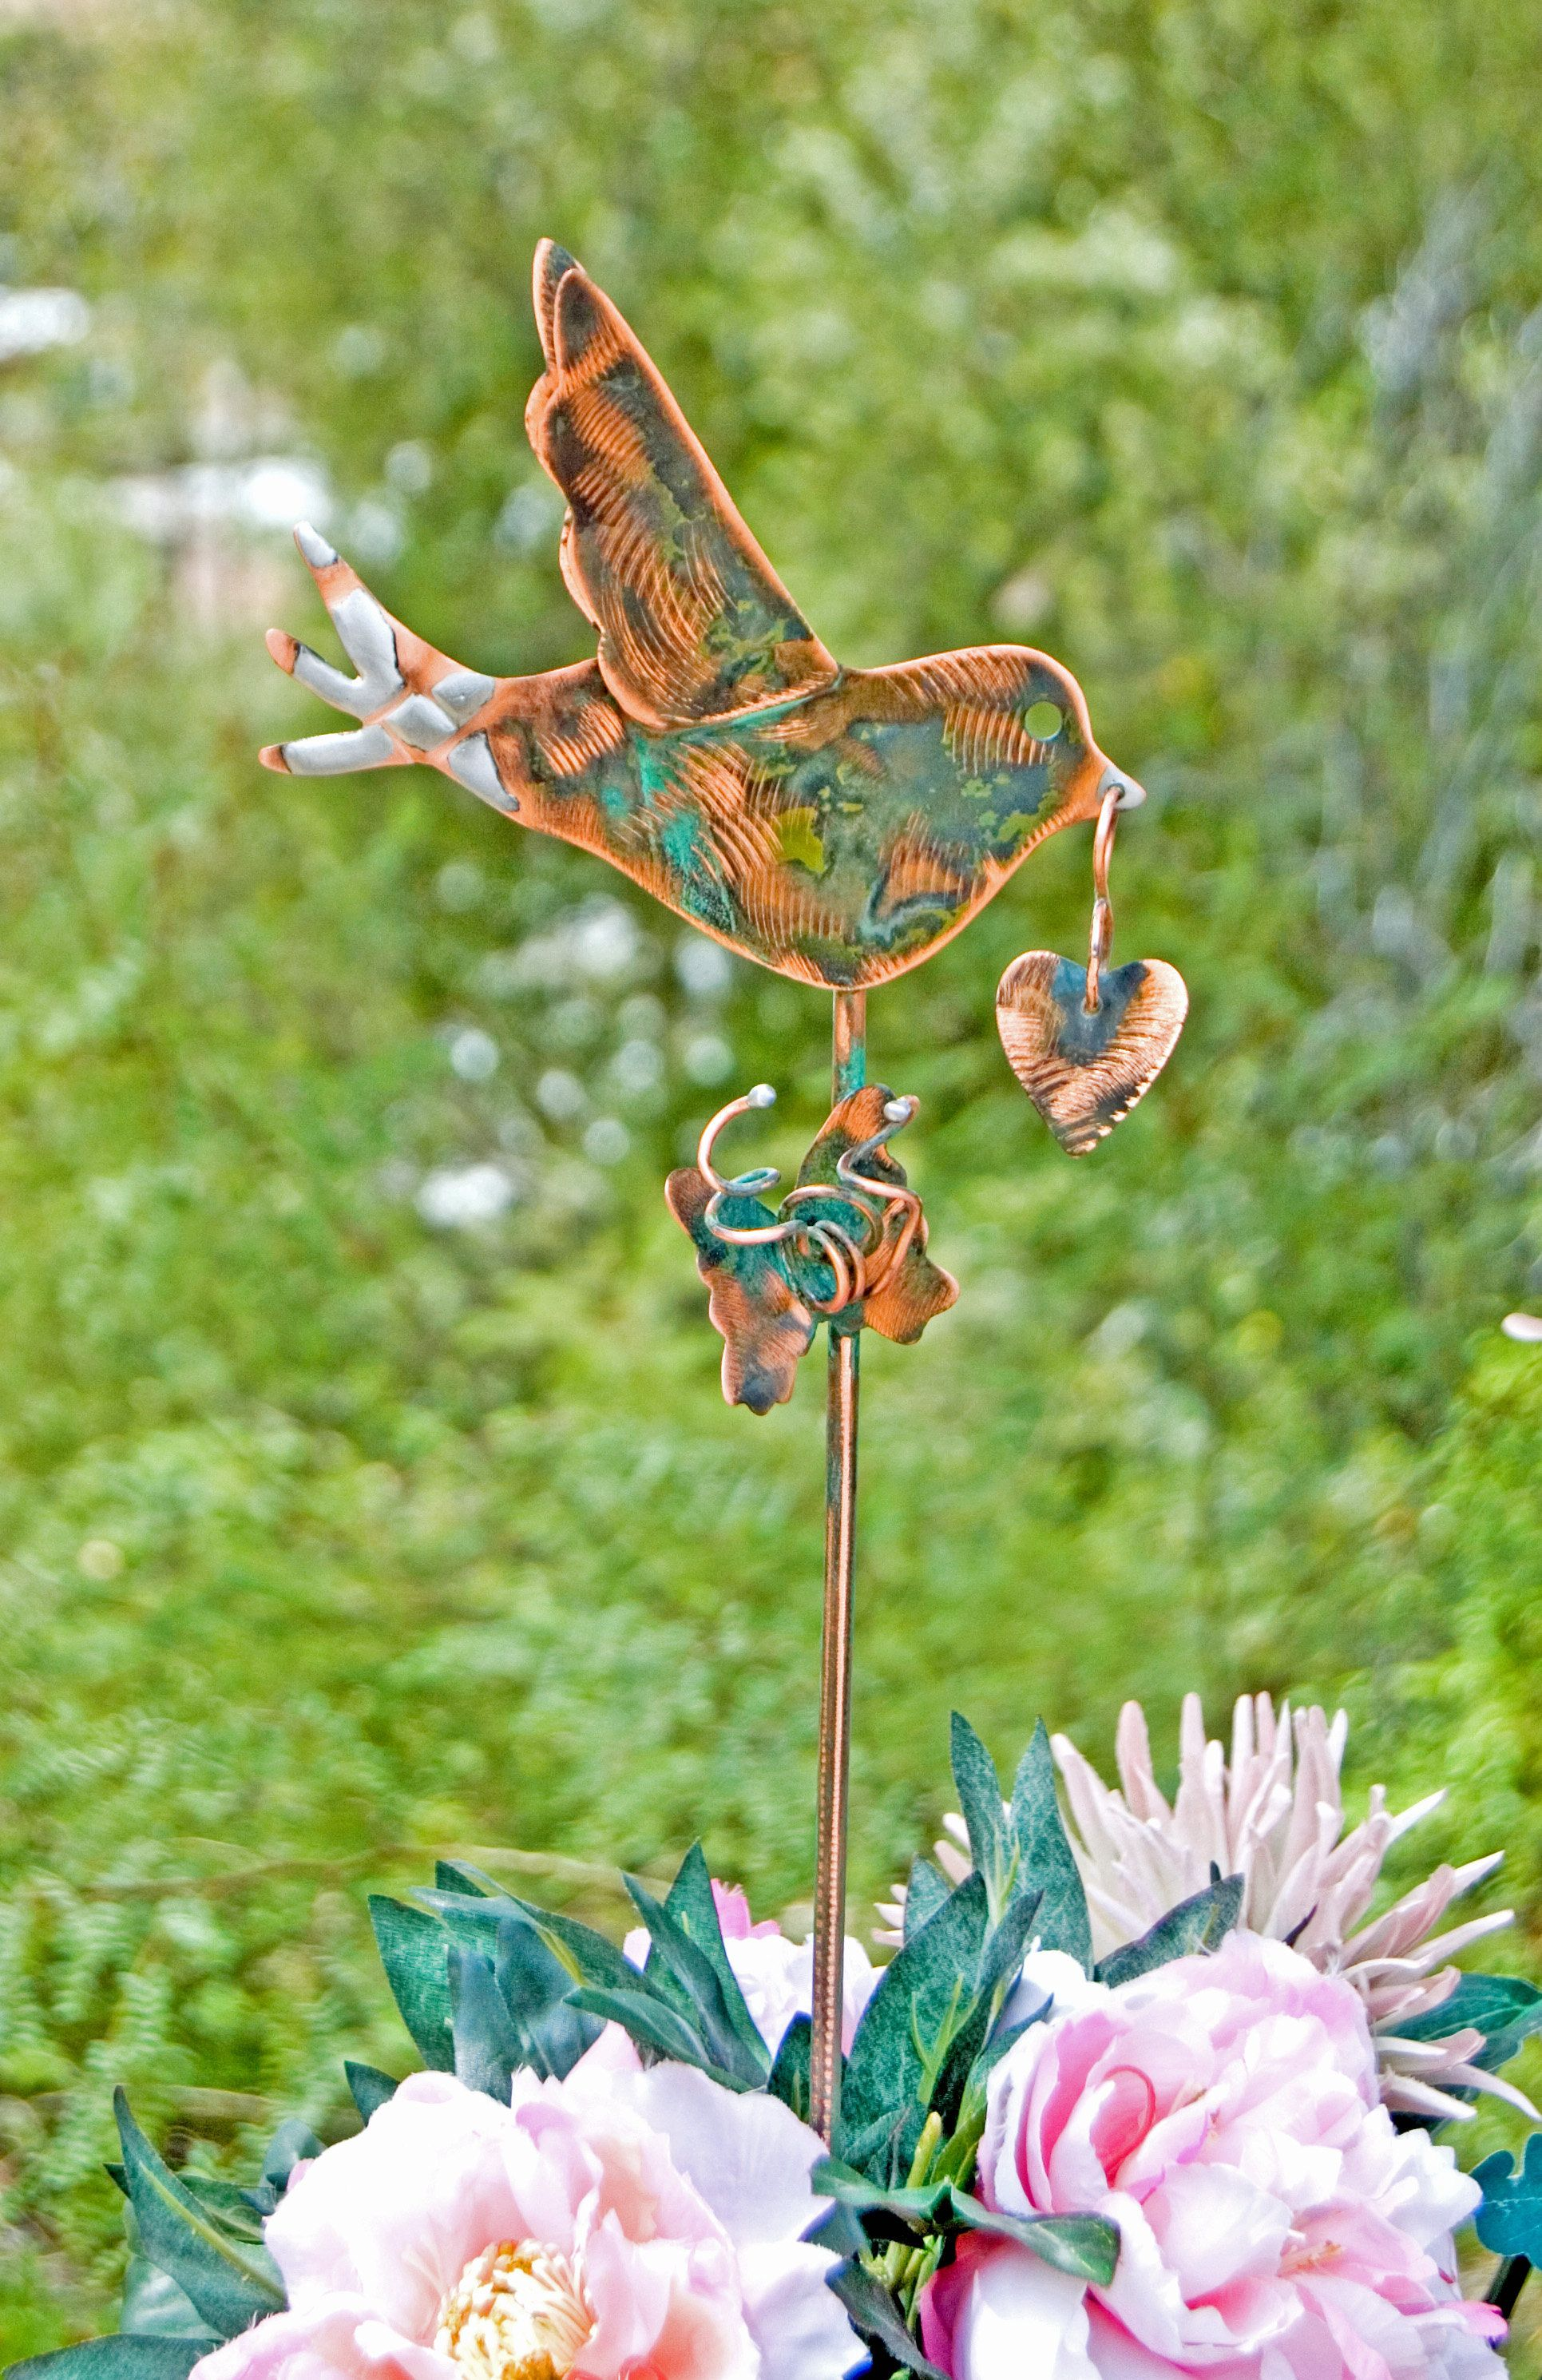 Bird nature outdoor metal garden sculpture yard art plant